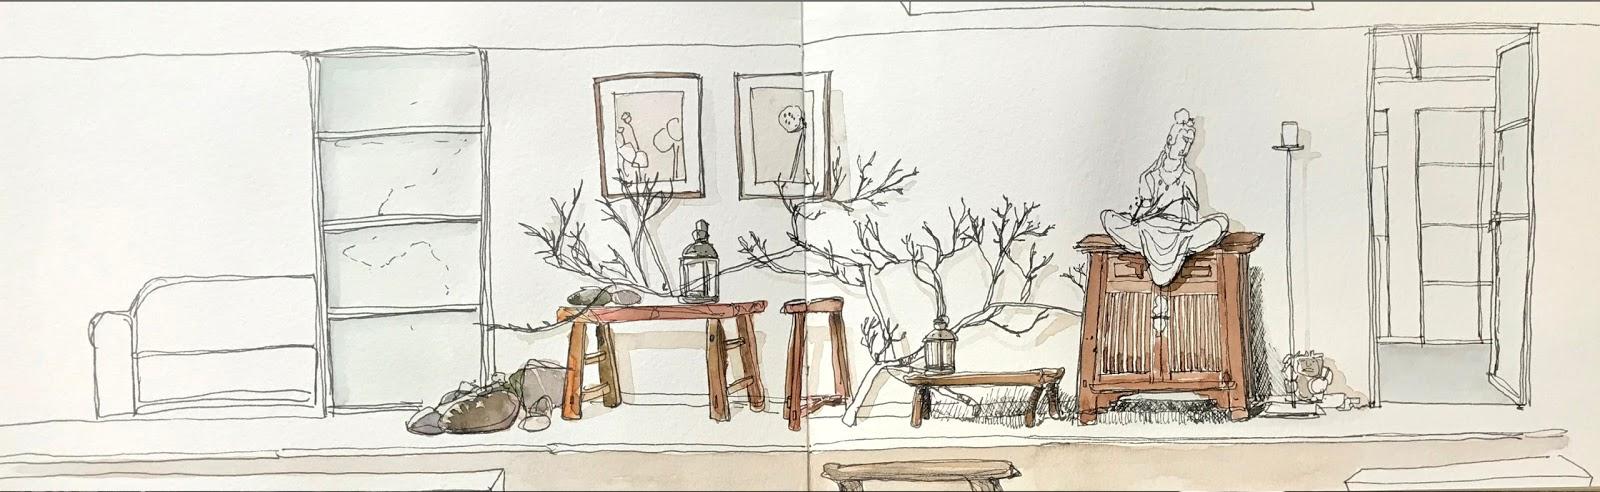 Farm House | Urban Sketchers